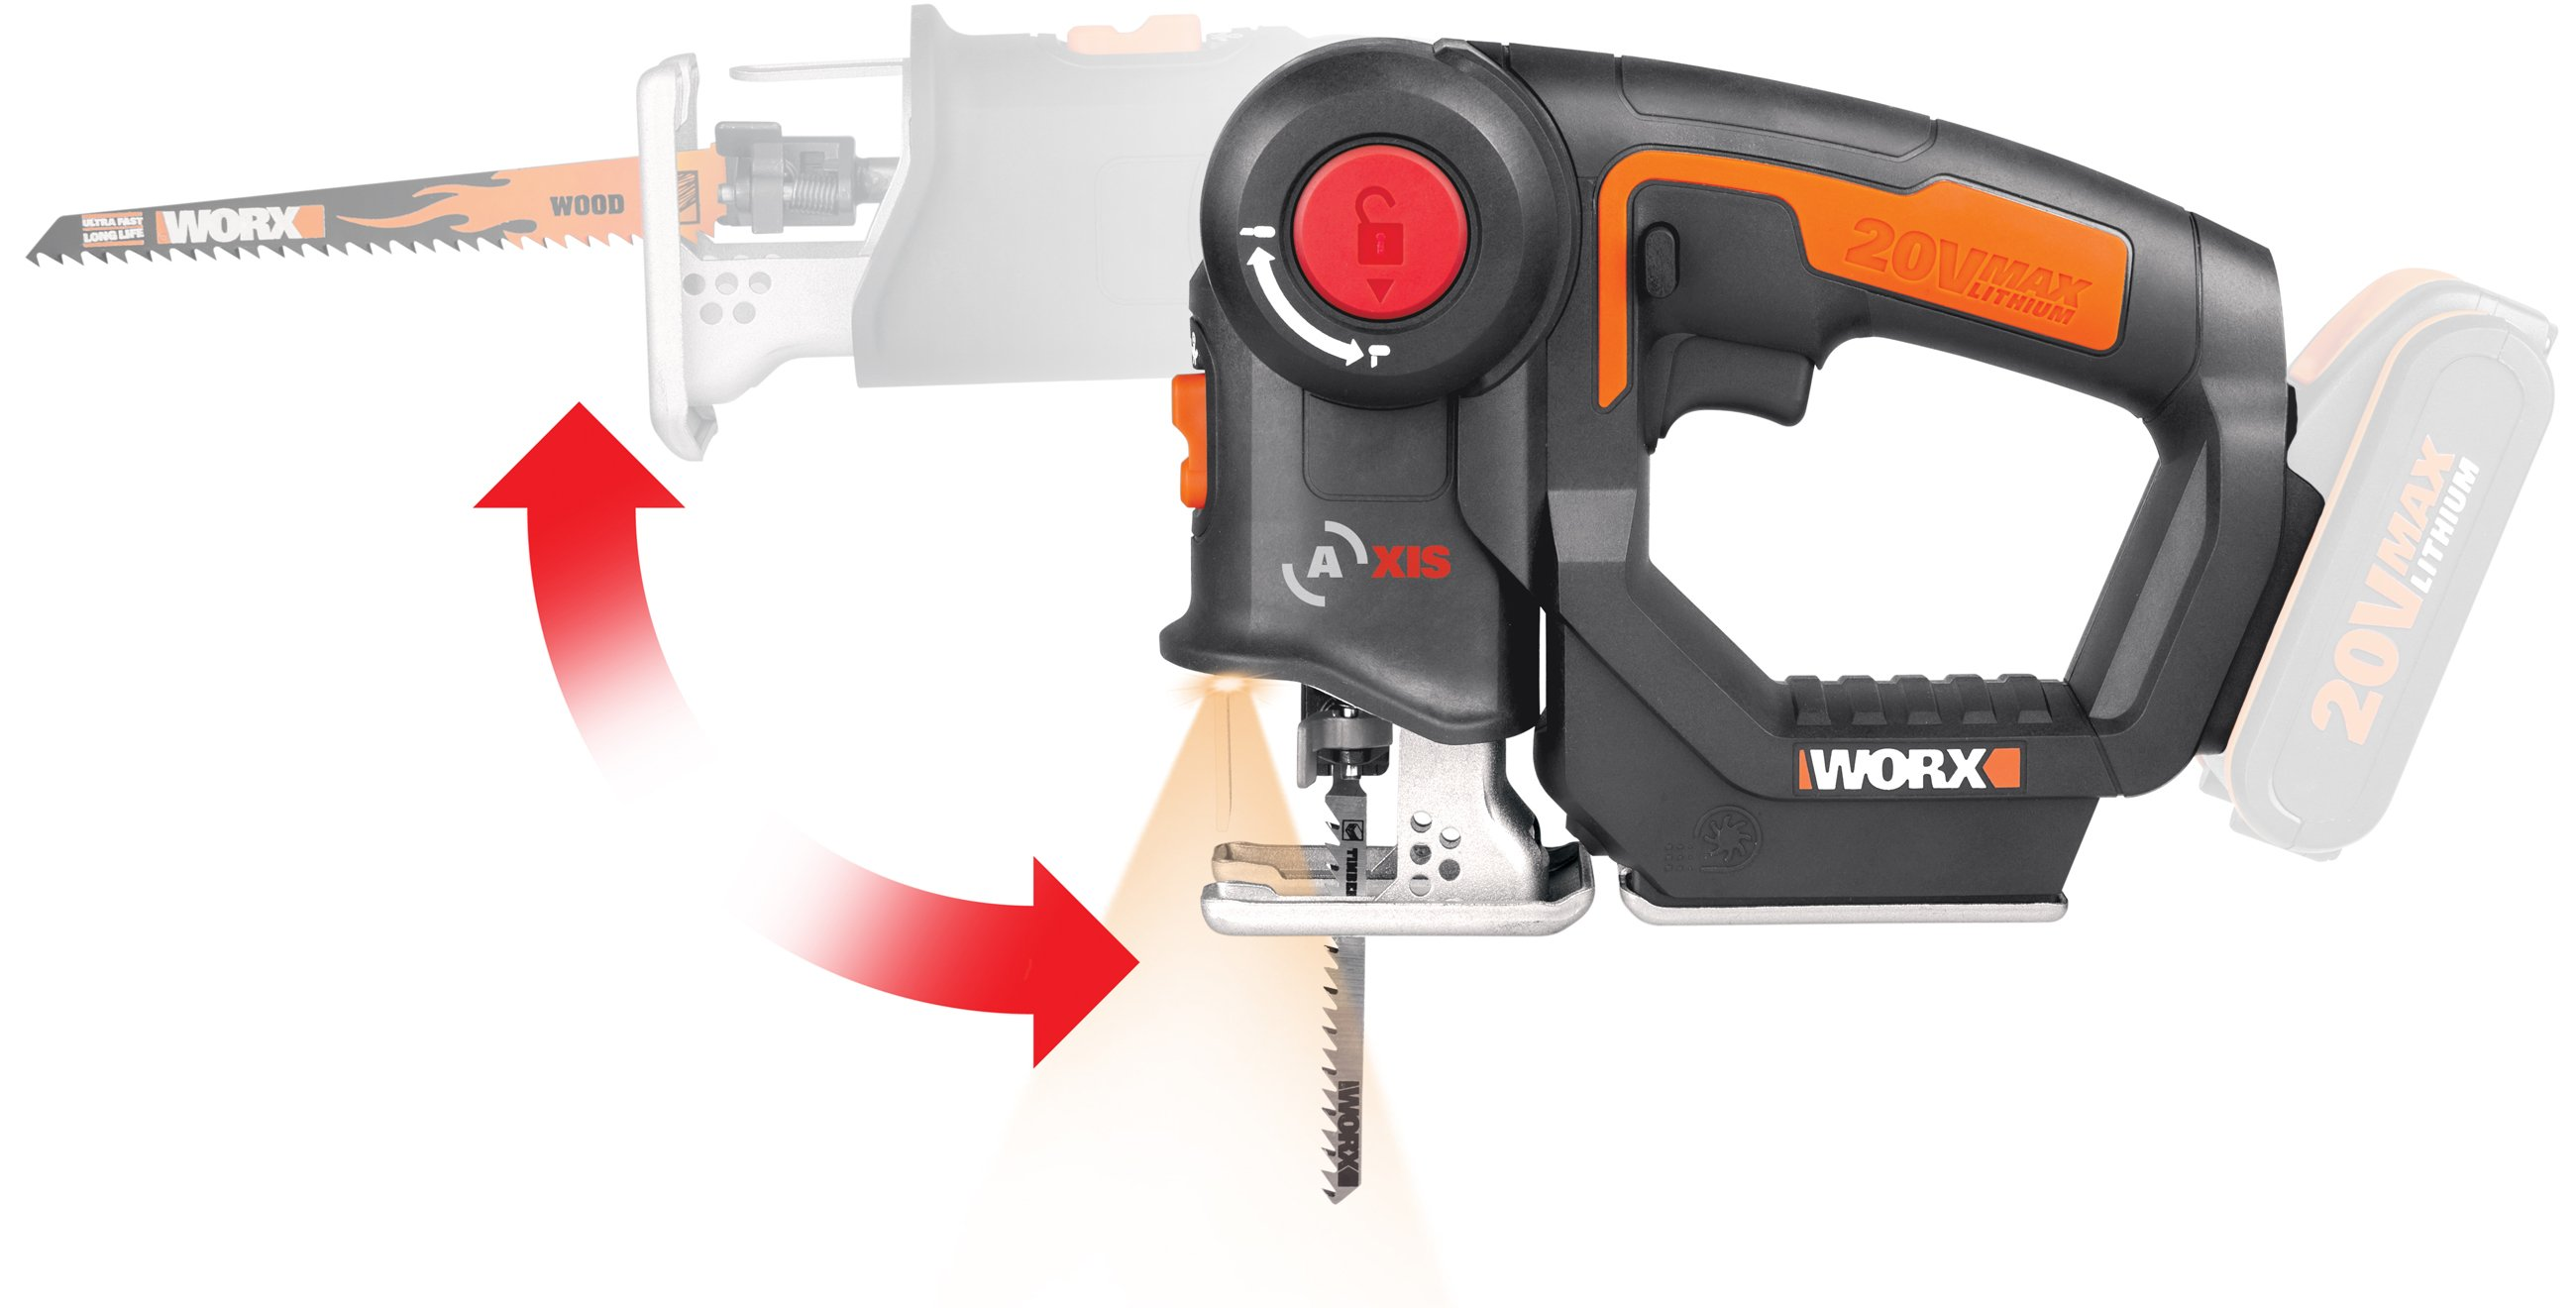 worx-wx550.9-akku-multisaege